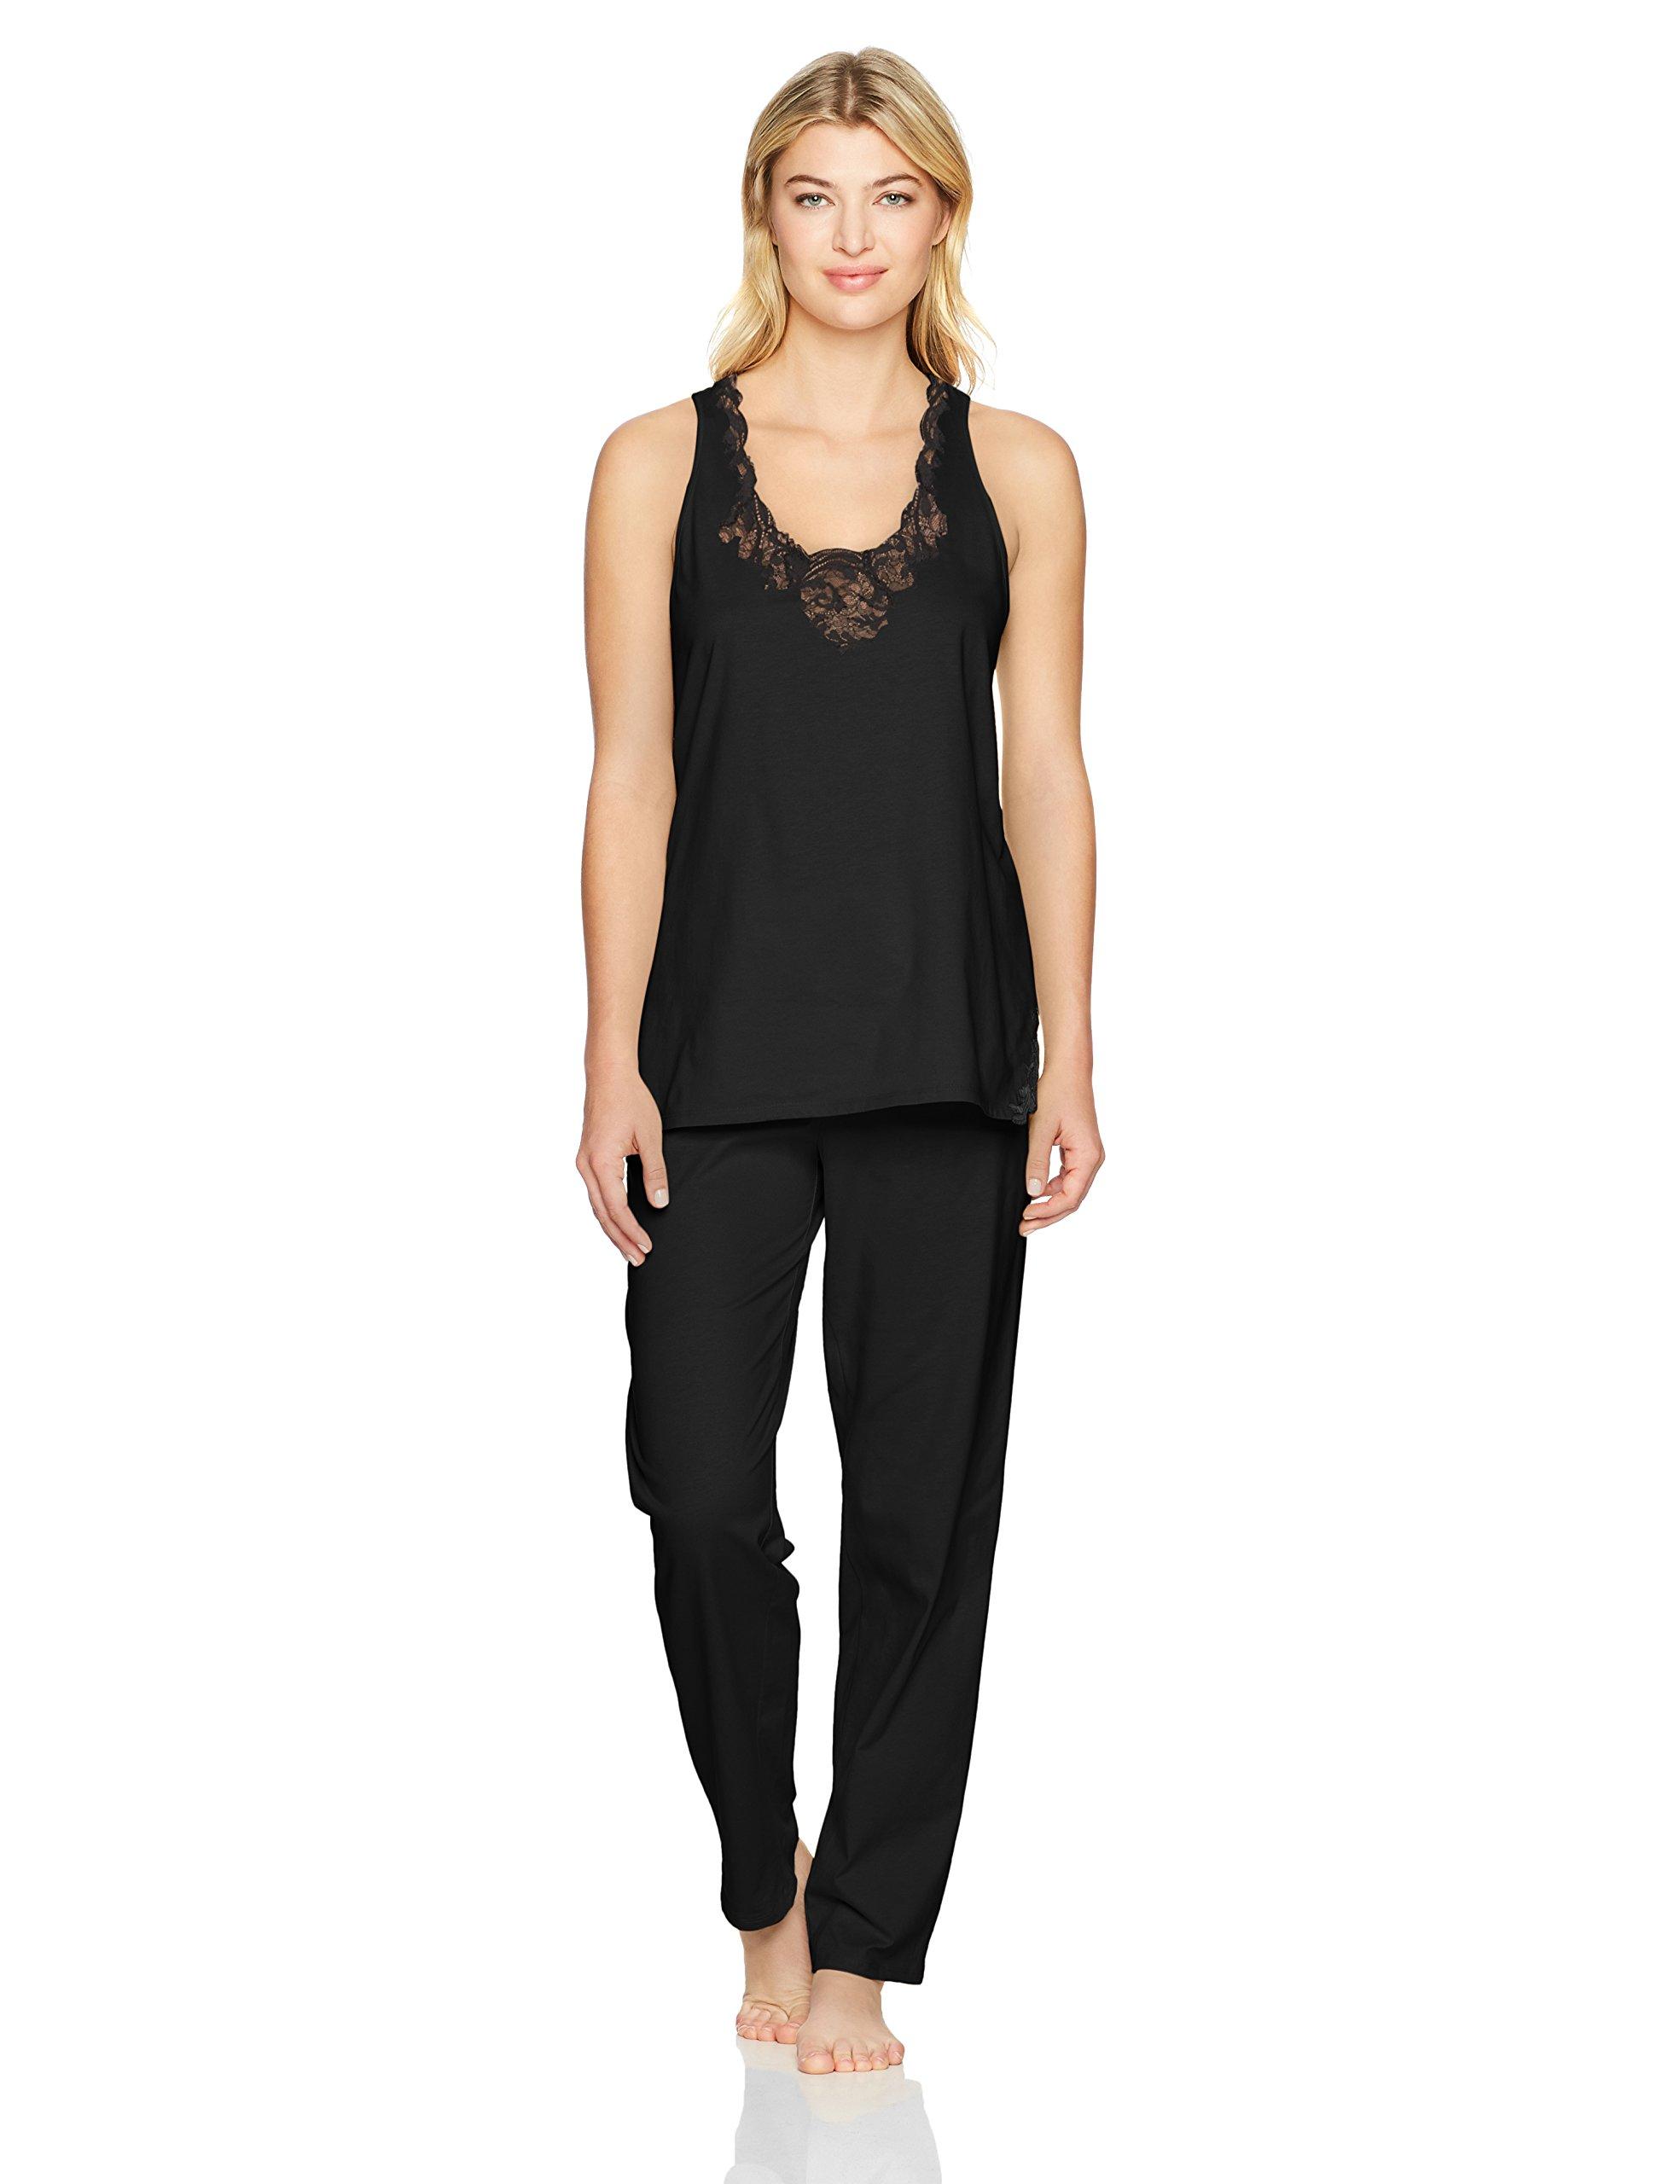 Natori Women's Bliss Cotton with Lace Pj, Black, Medium